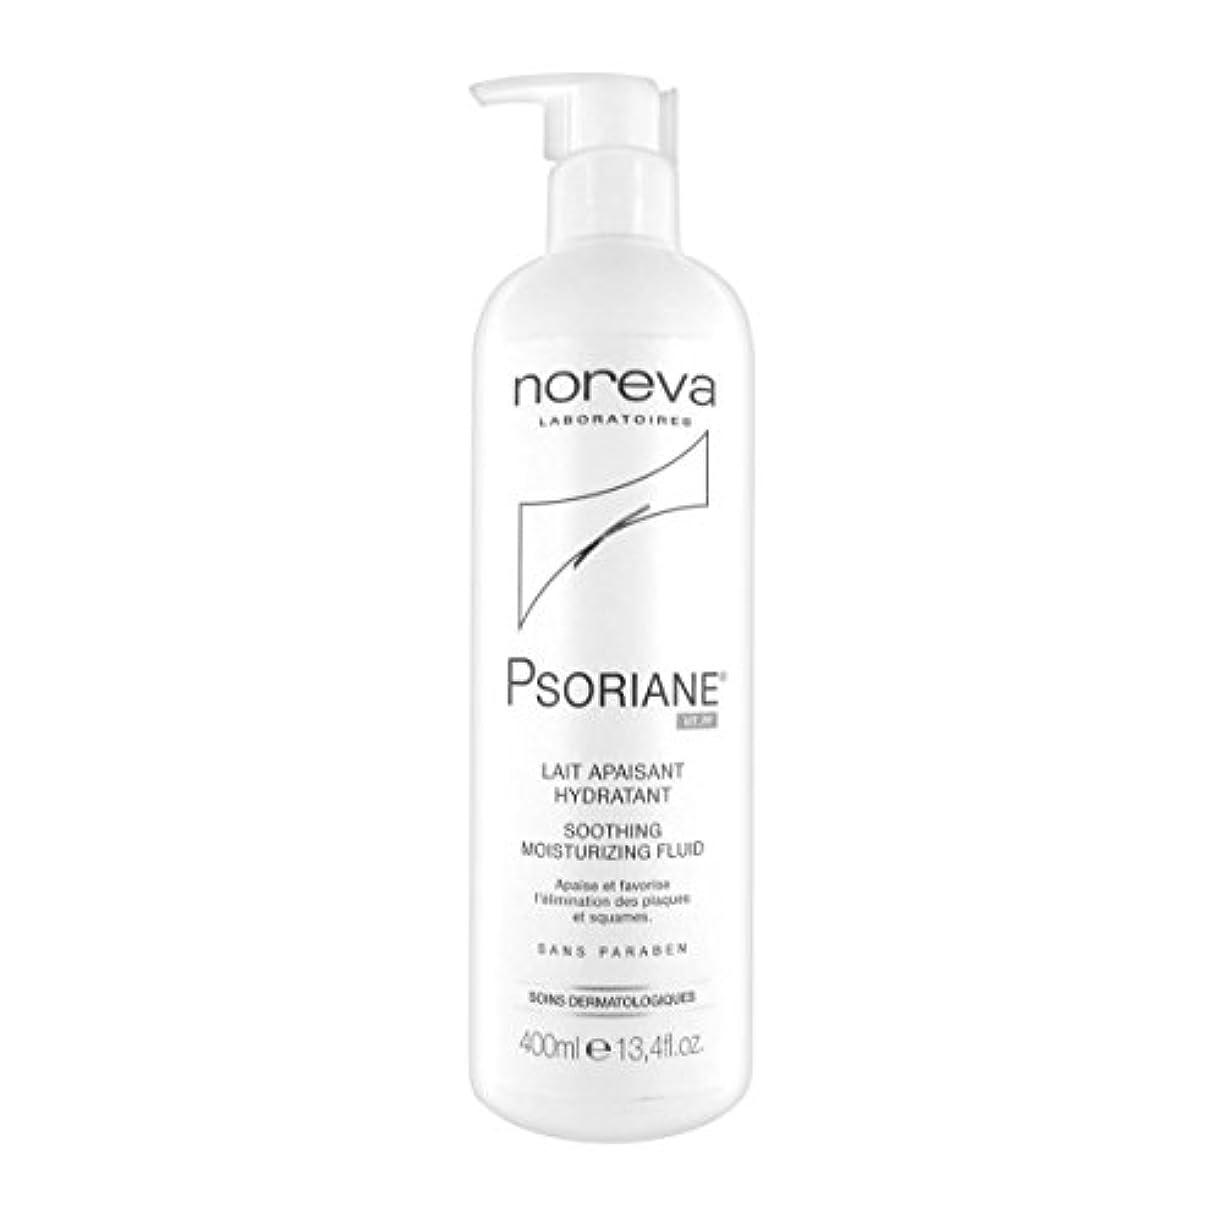 Noreva Psoriane Soothing Moisturizing Fluid 400ml [並行輸入品]